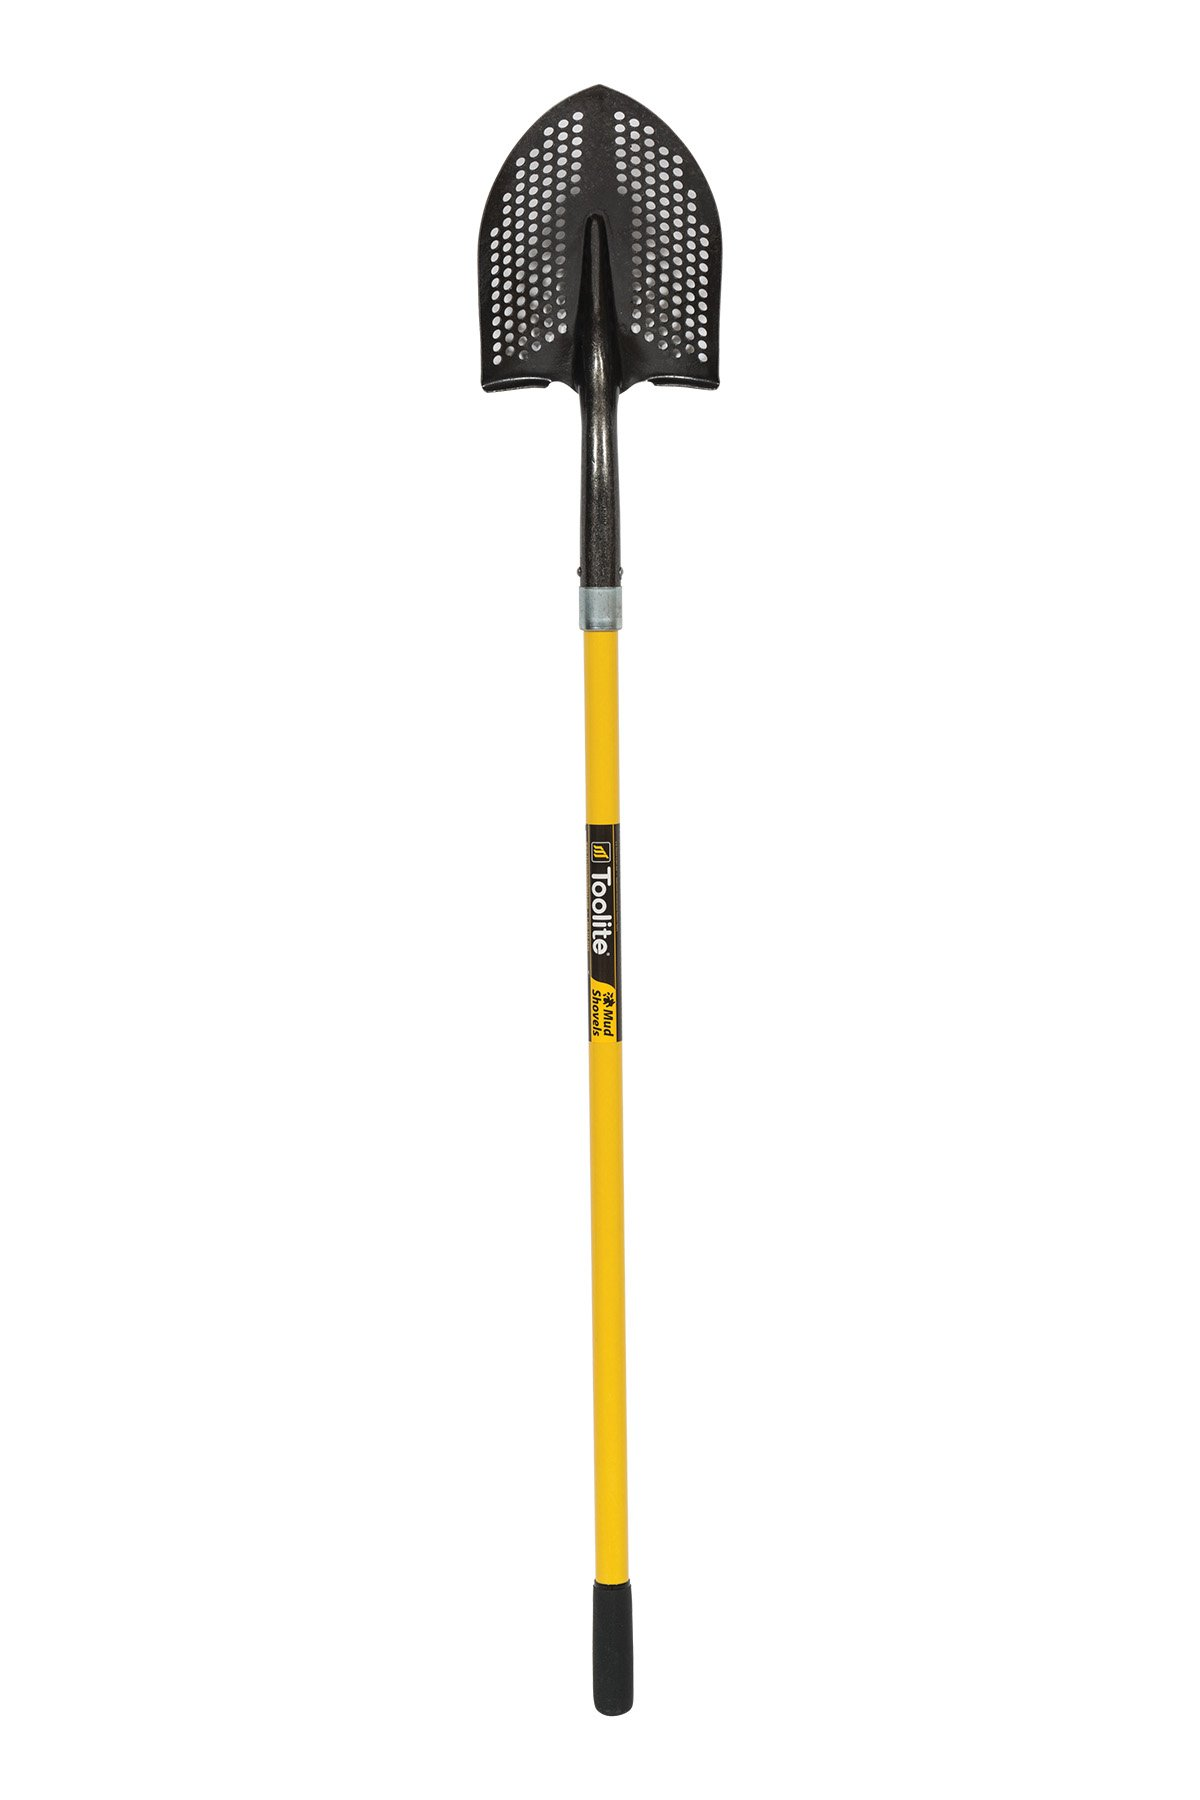 Toolite 49500#2 Round Point Shovel, 48'' Yellow Fiberglass Handle by Toolite